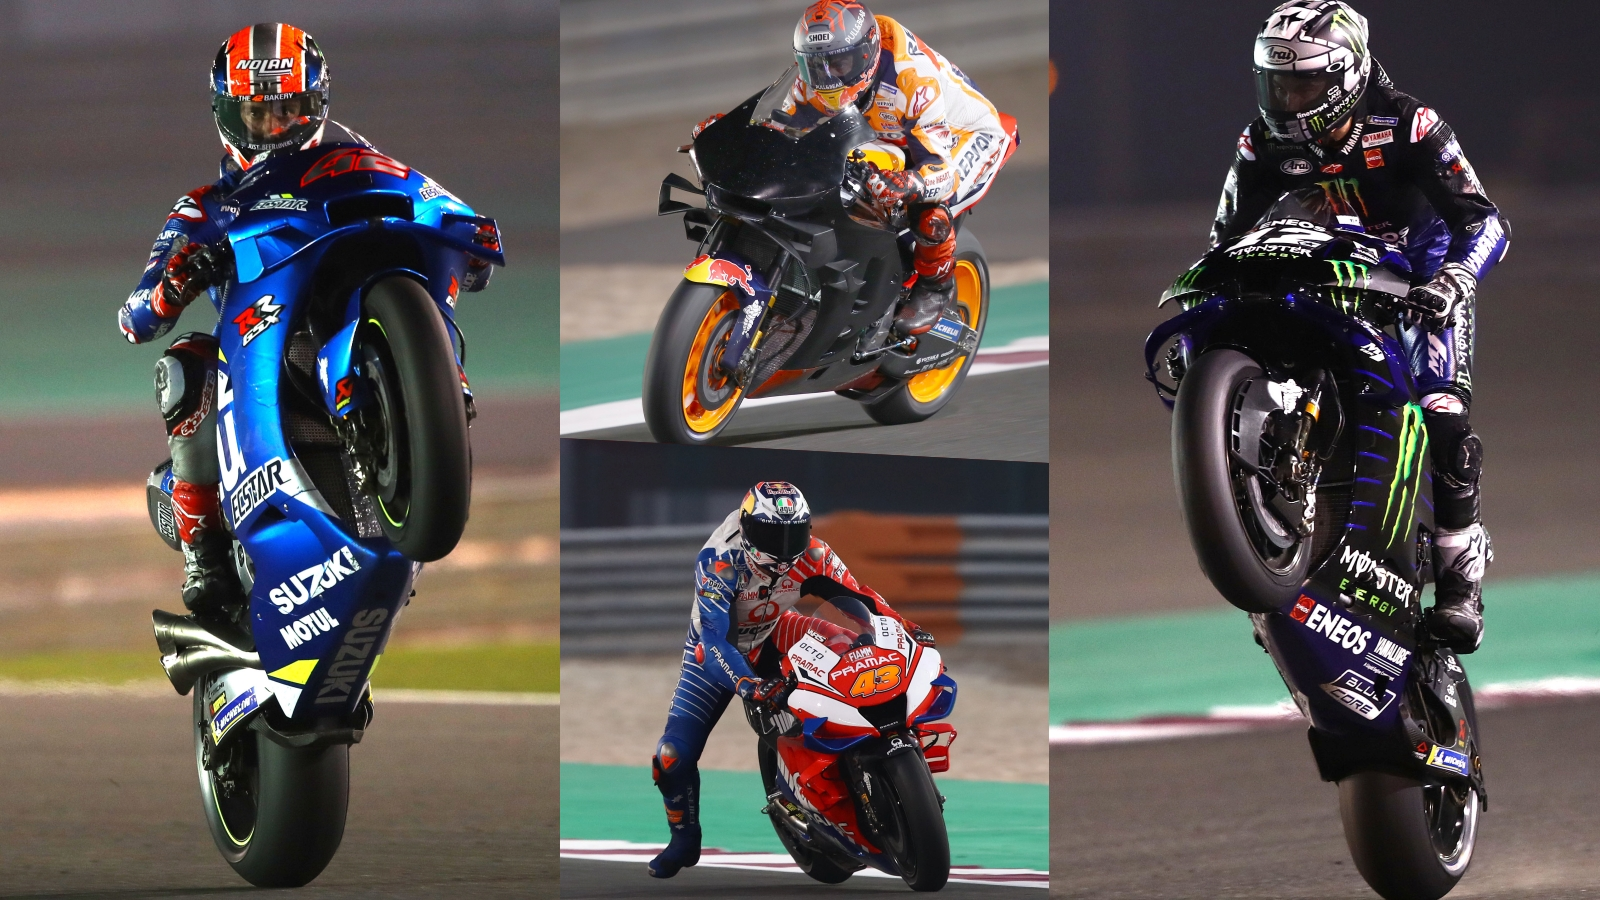 MotoGP 2020: Yamaha asusta, Suzuki ilusiona, Ducati despista y Honda tira sobre la bocina